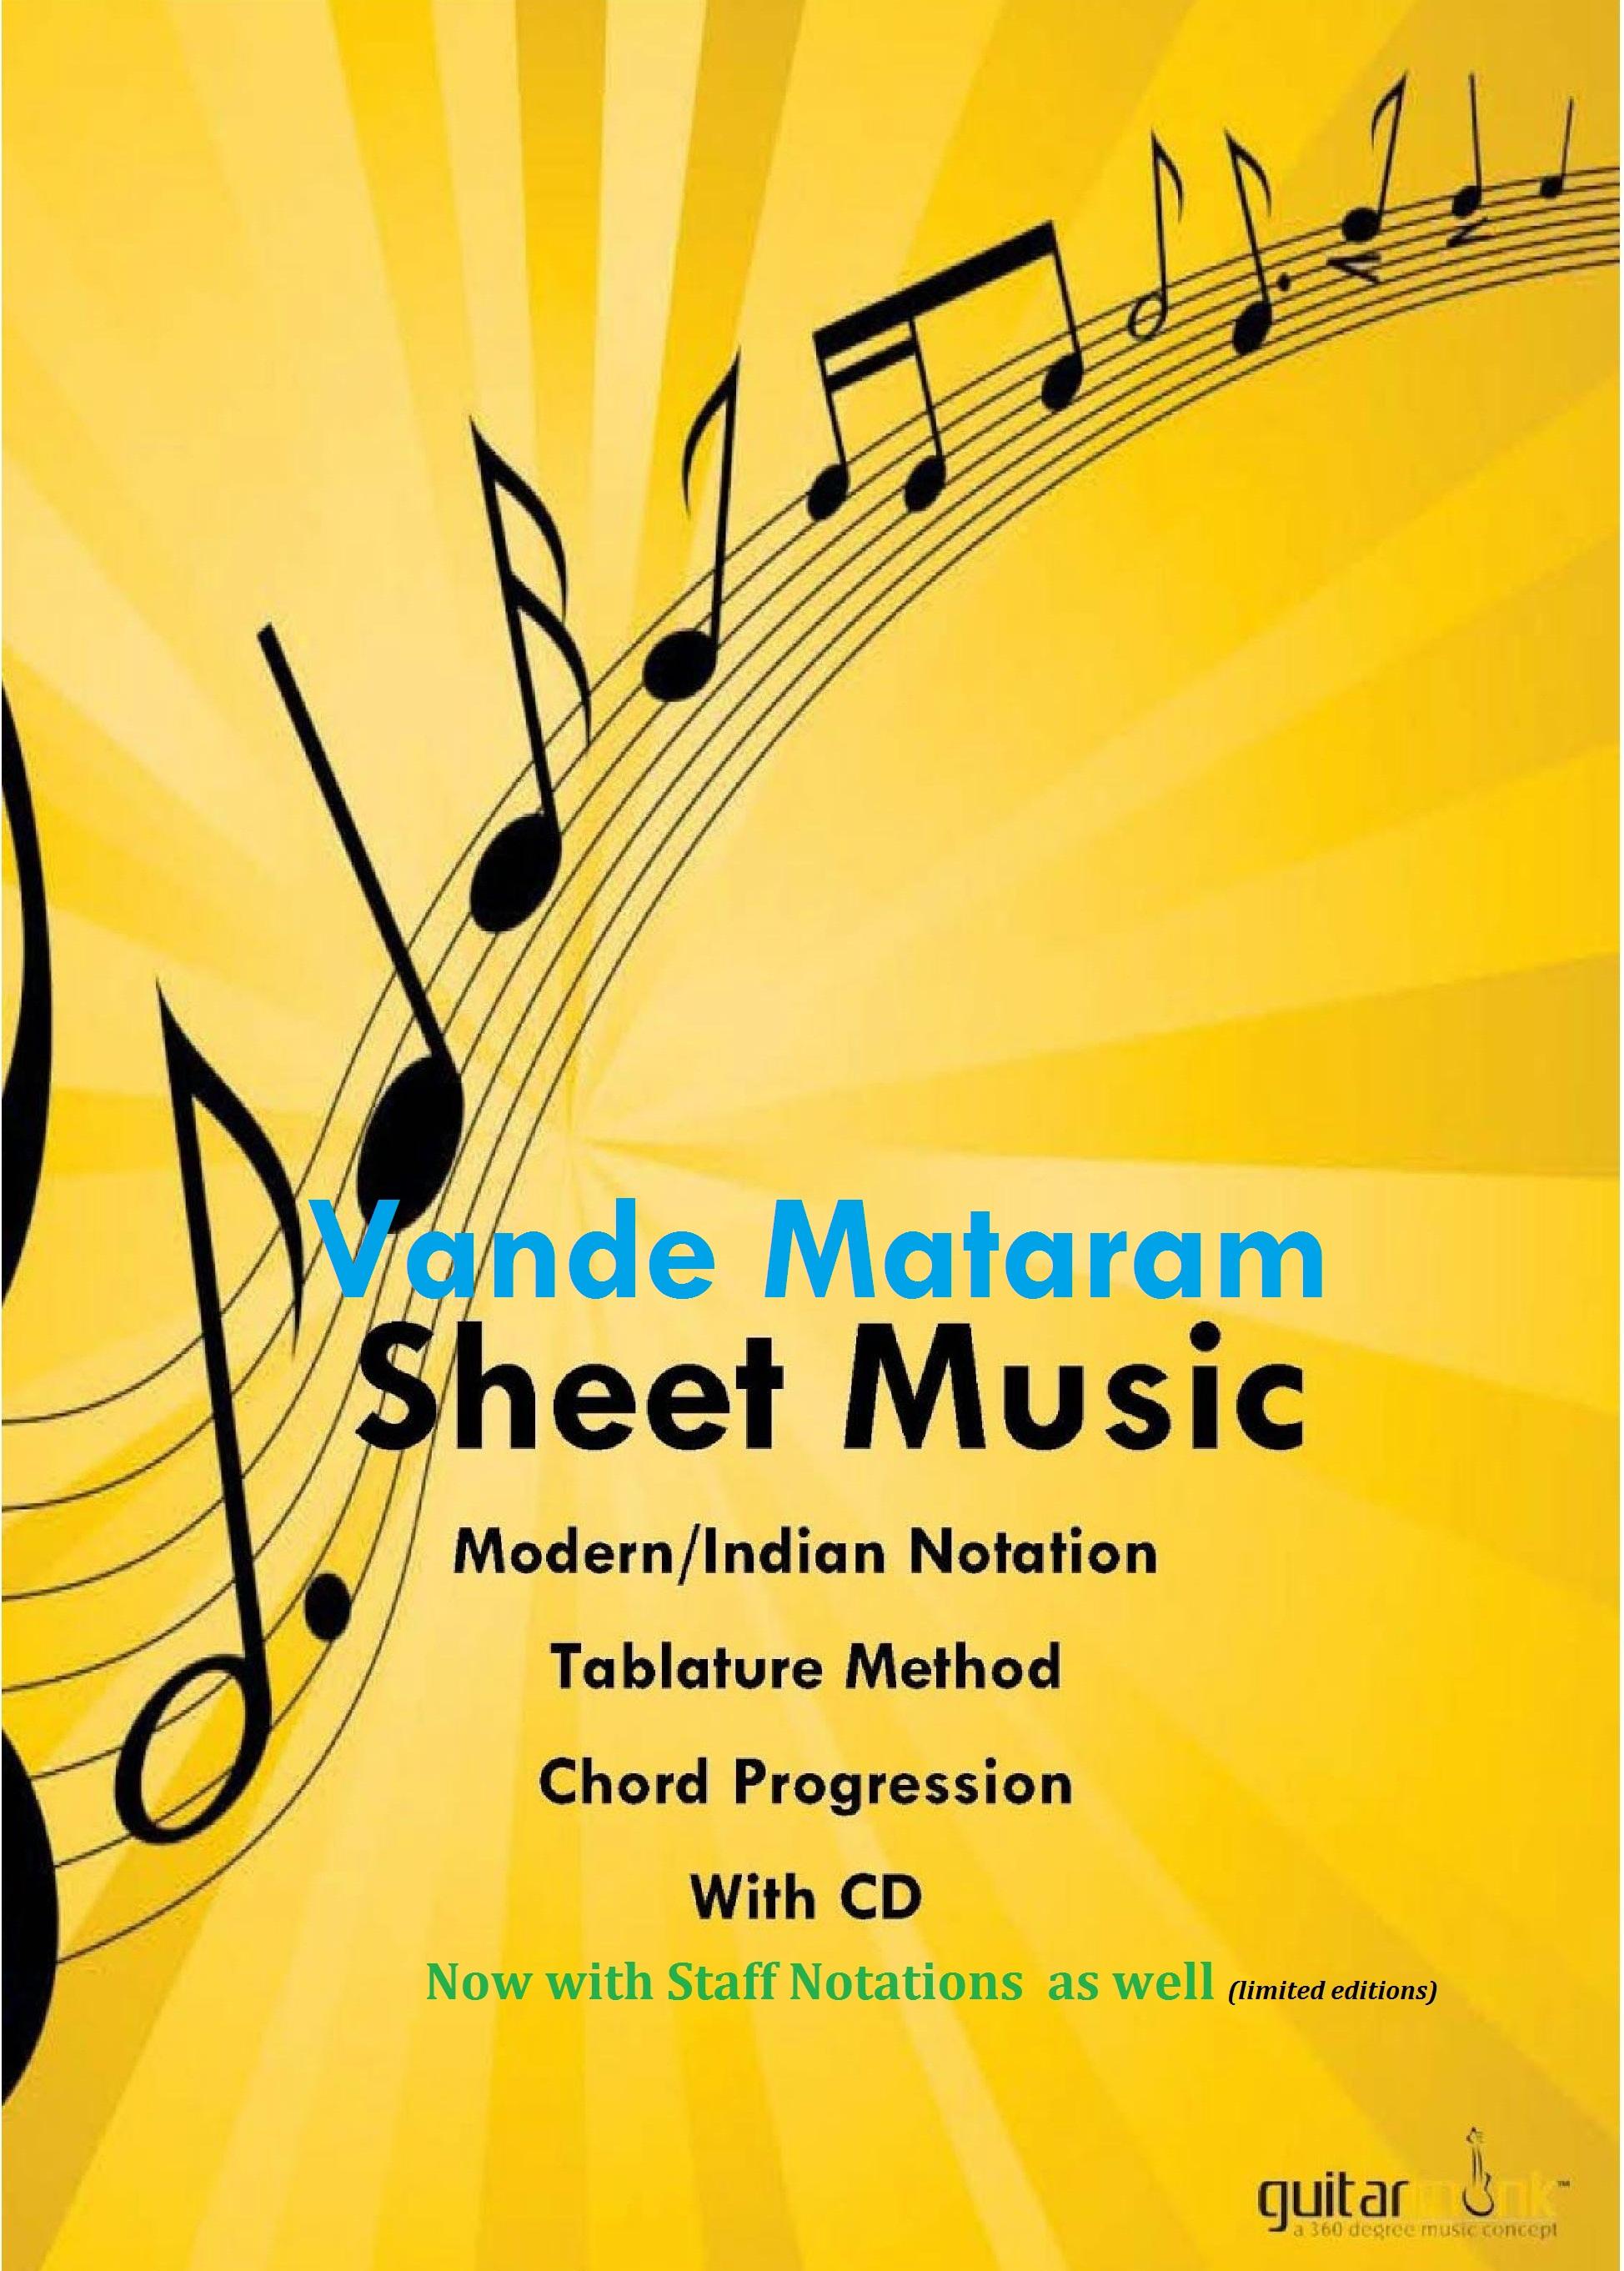 Vande Mataram Sheet Music Notations